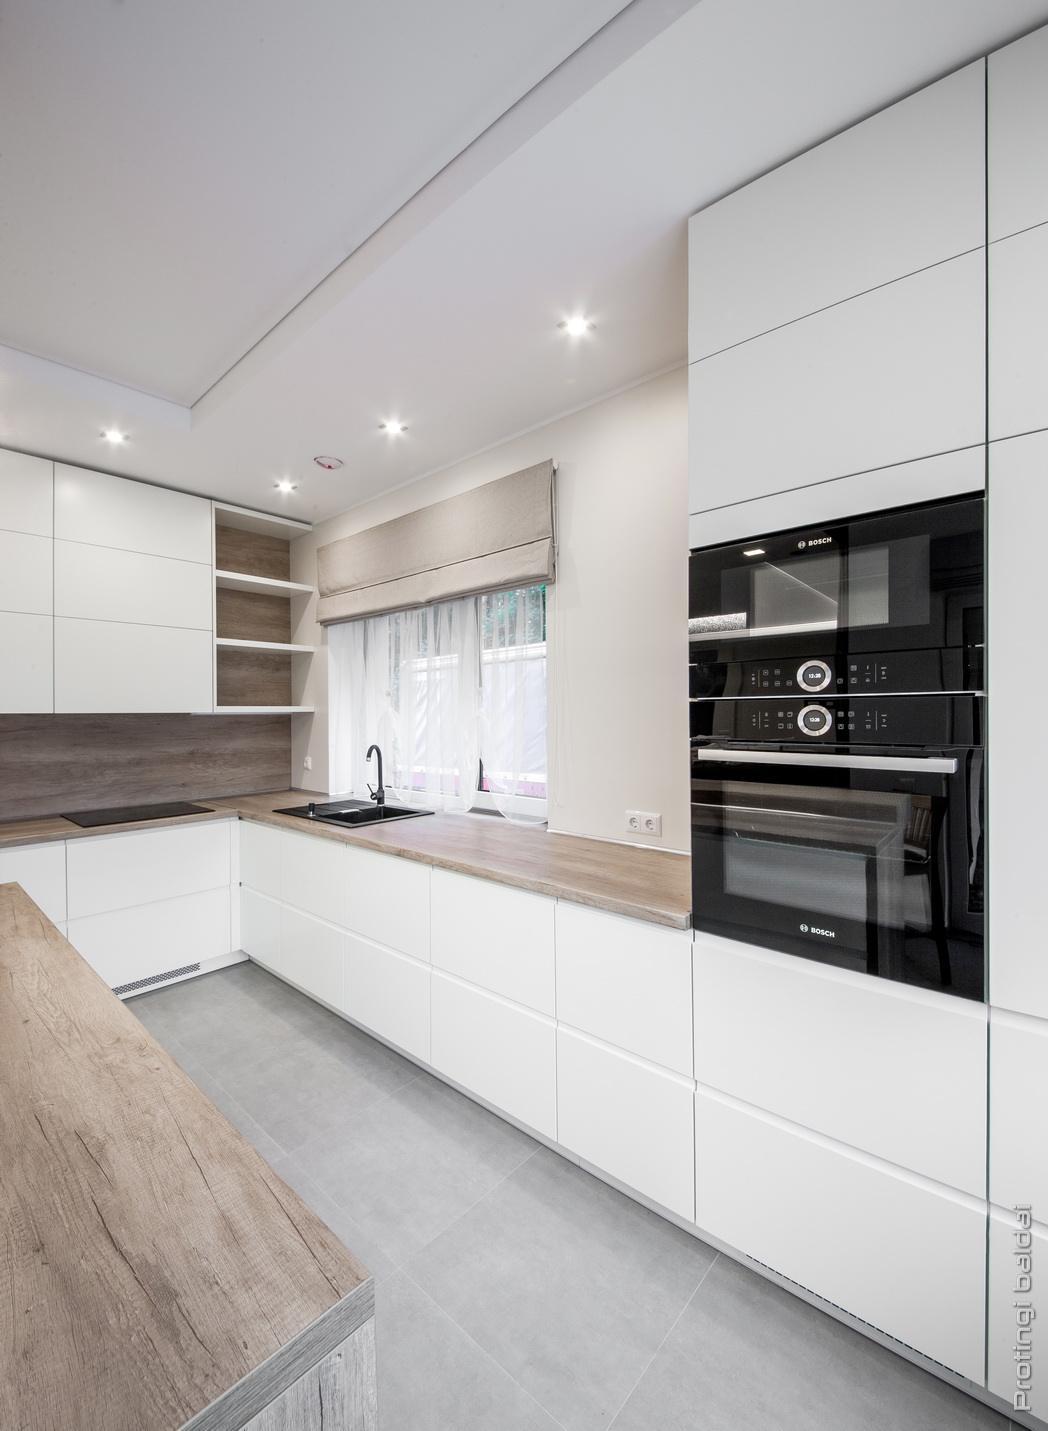 virtuves_baldai_pb22_05